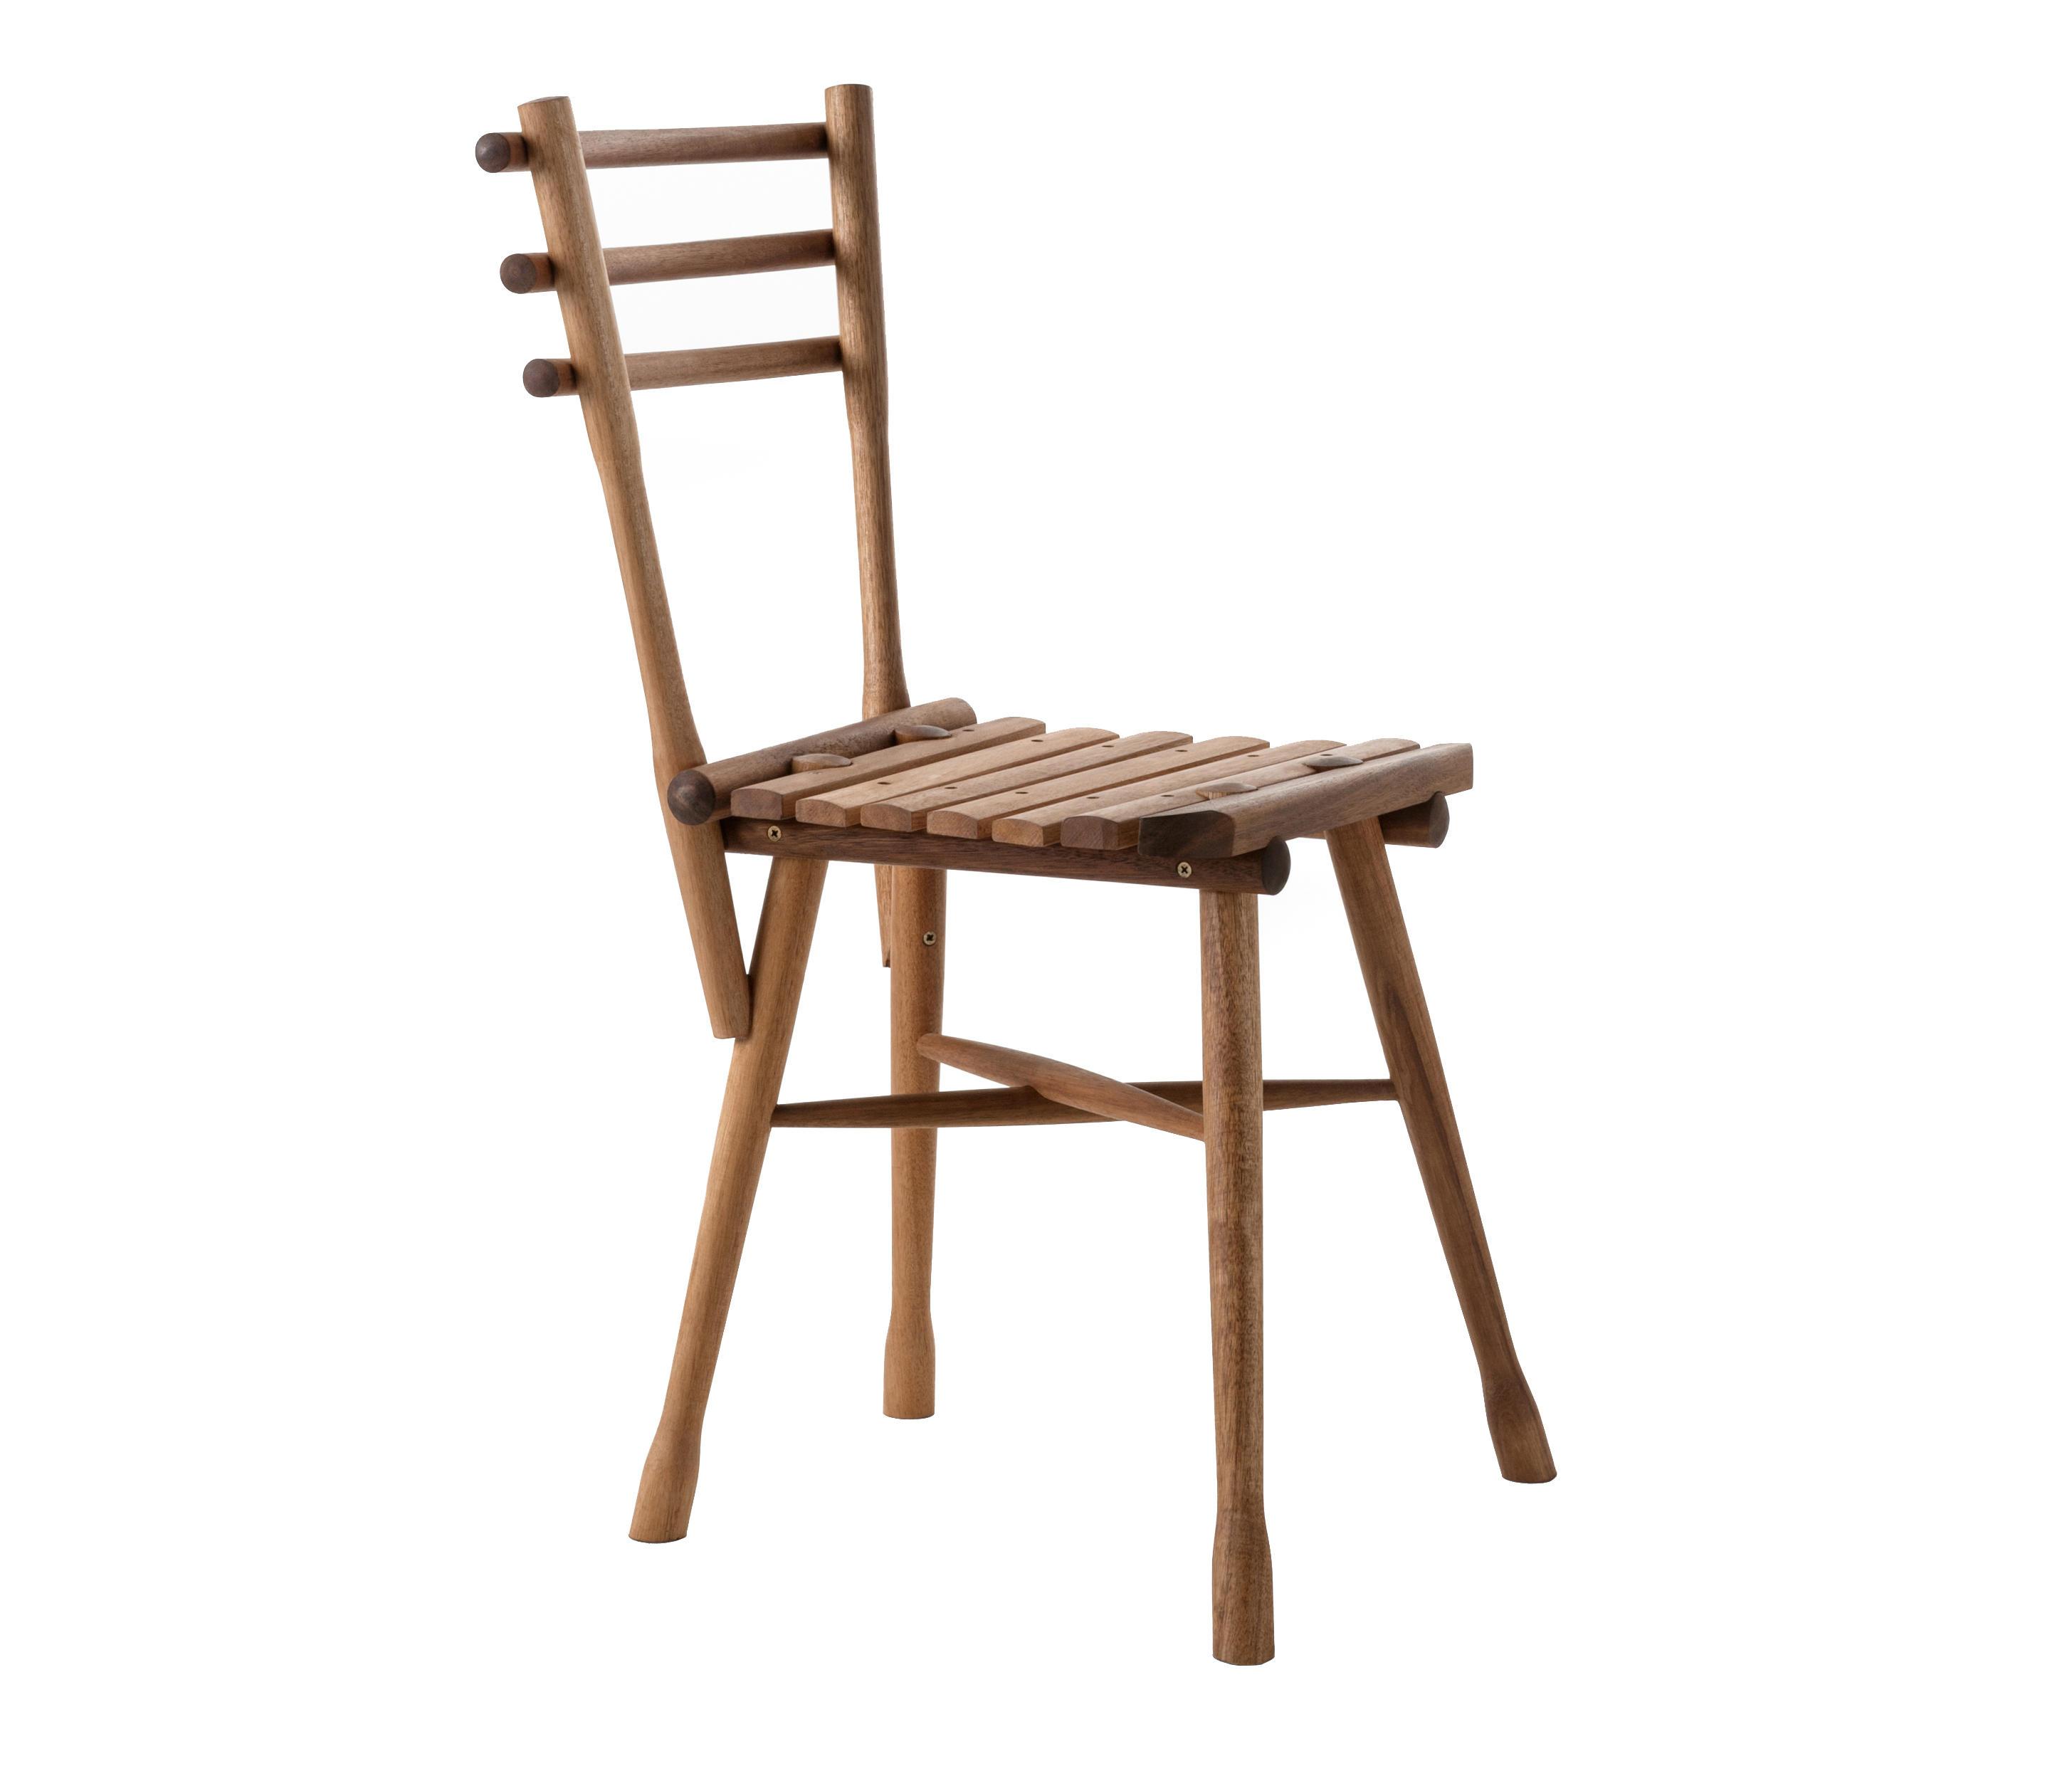 GARDEN CHAIR - Chairs from WIENER GTV DESIGN  Architonic